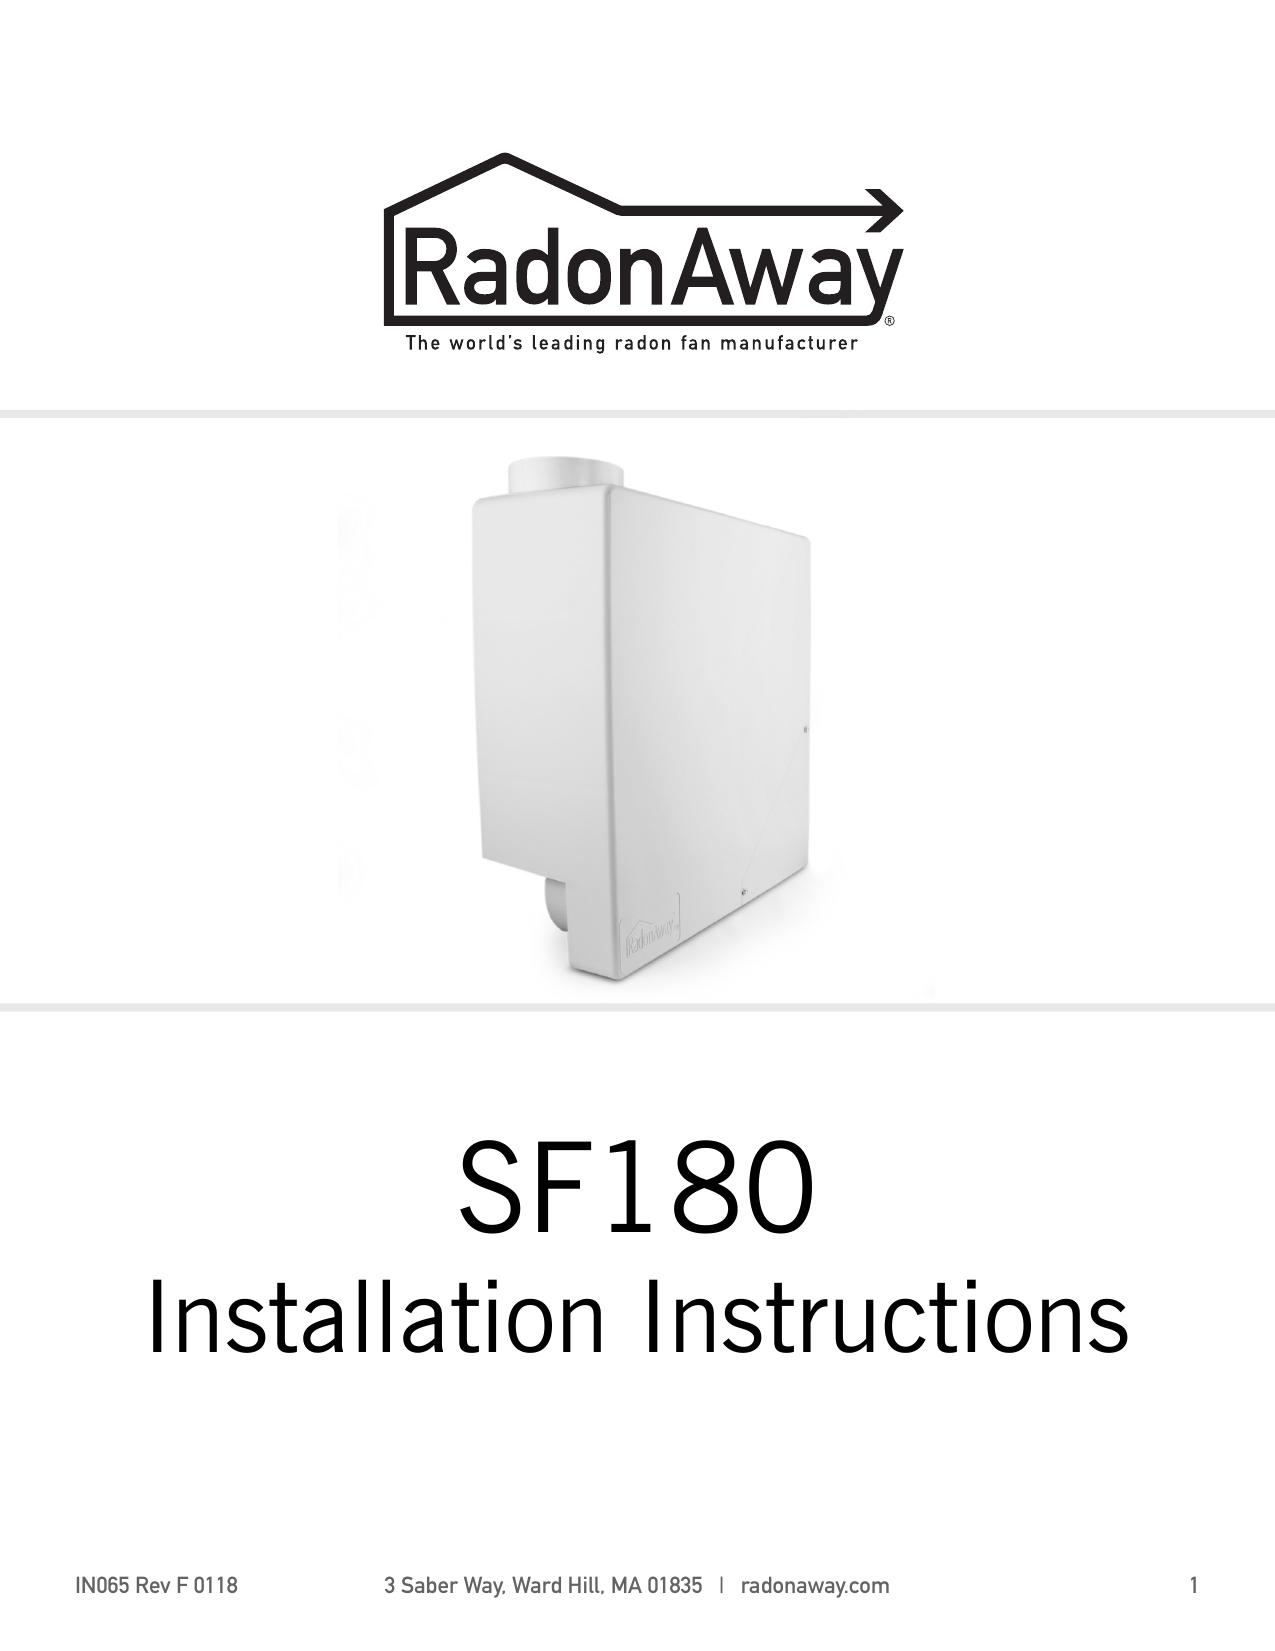 Radonaway 28317 Installation Guide Manualzz